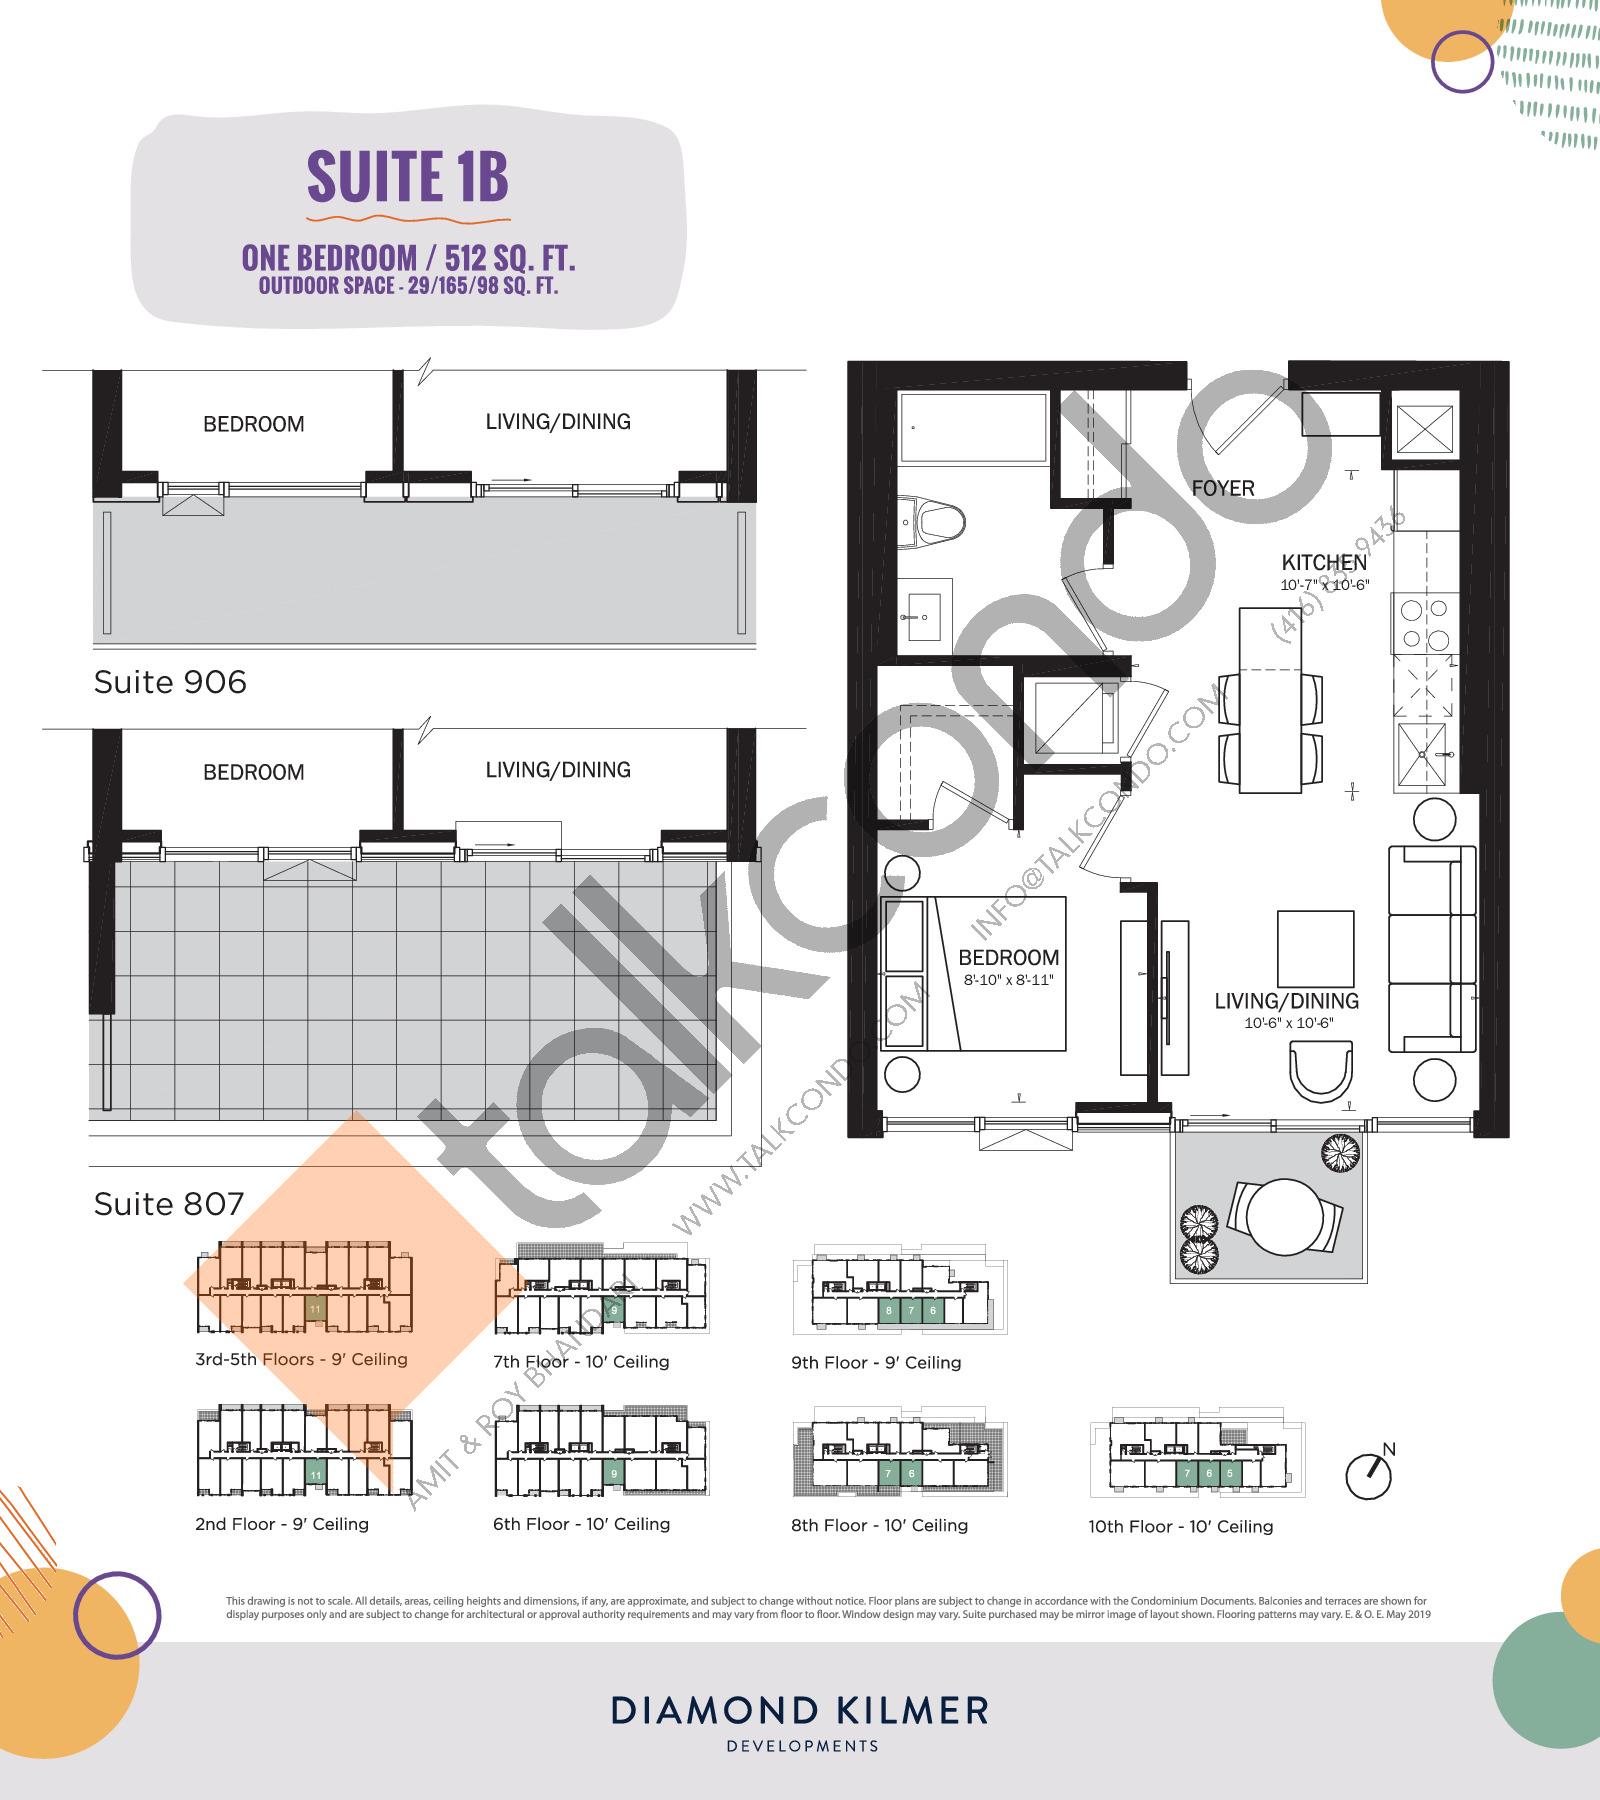 1B Floor Plan at Reunion Crossing Condos & Urban Towns - 512 sq.ft